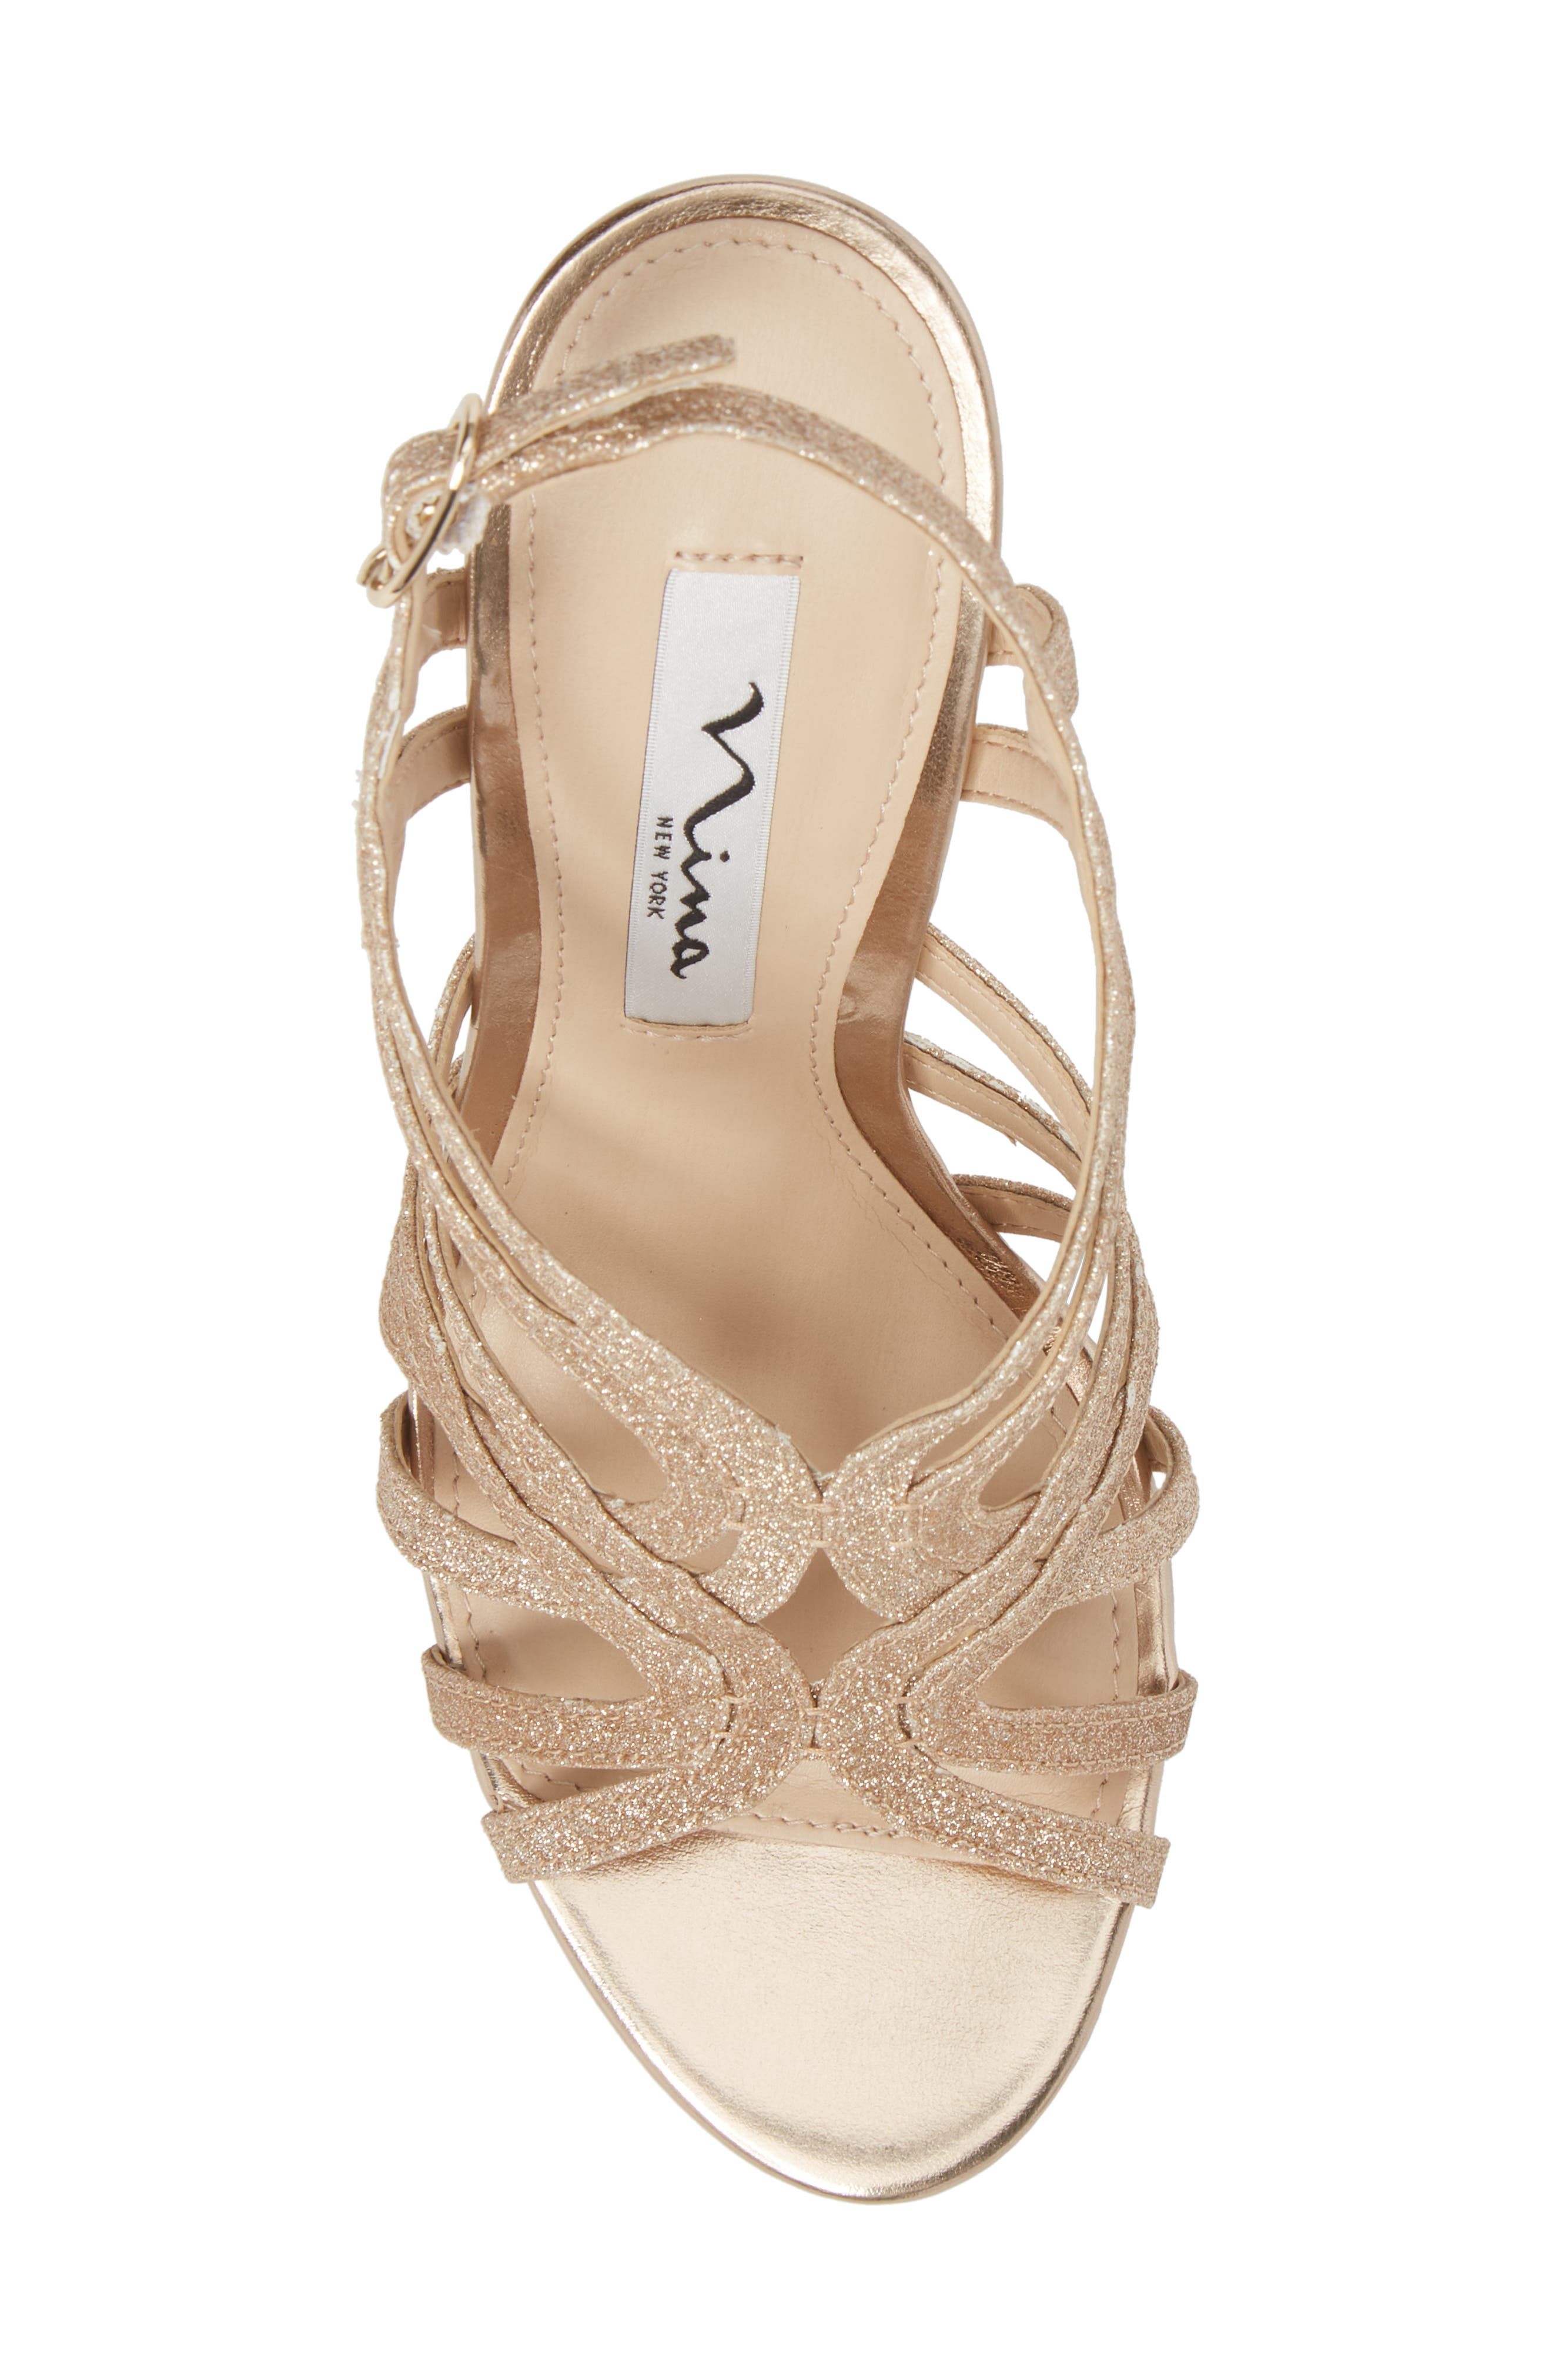 Solina Platform Sandal,                             Alternate thumbnail 5, color,                             Gold Glitter Fabric